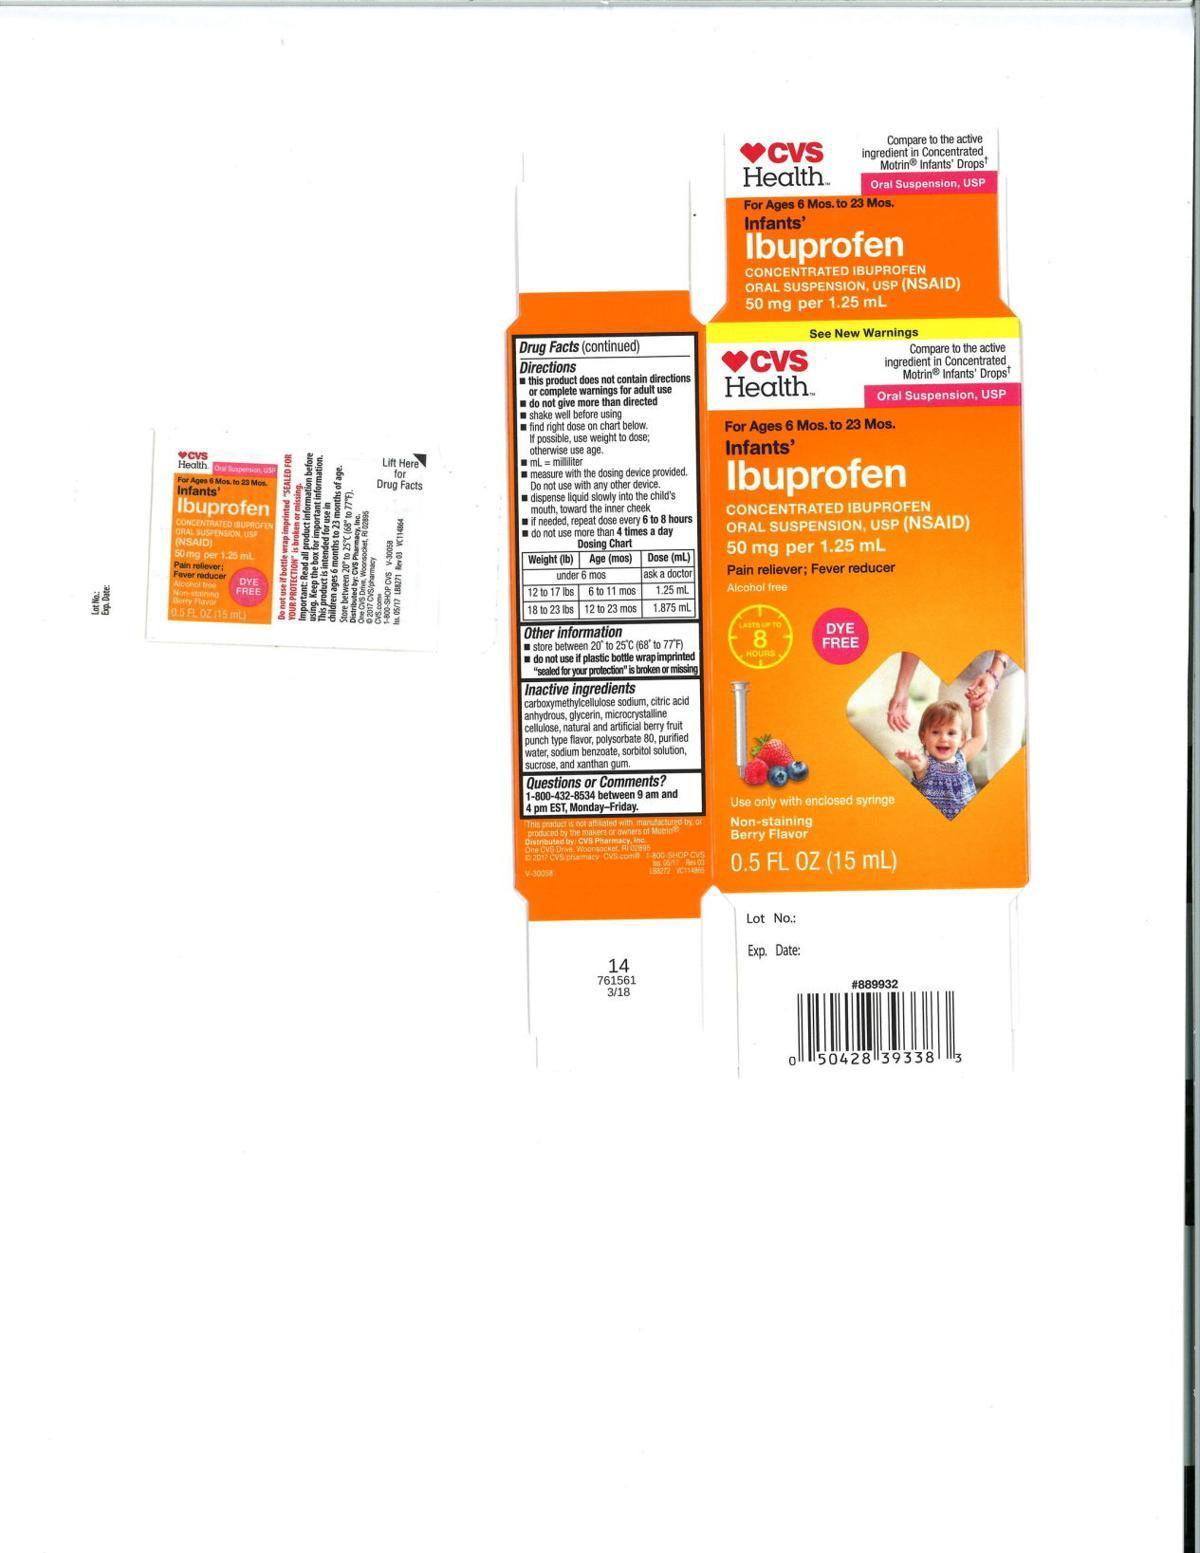 Recalled Ibuprofen - CVS Pharmacy